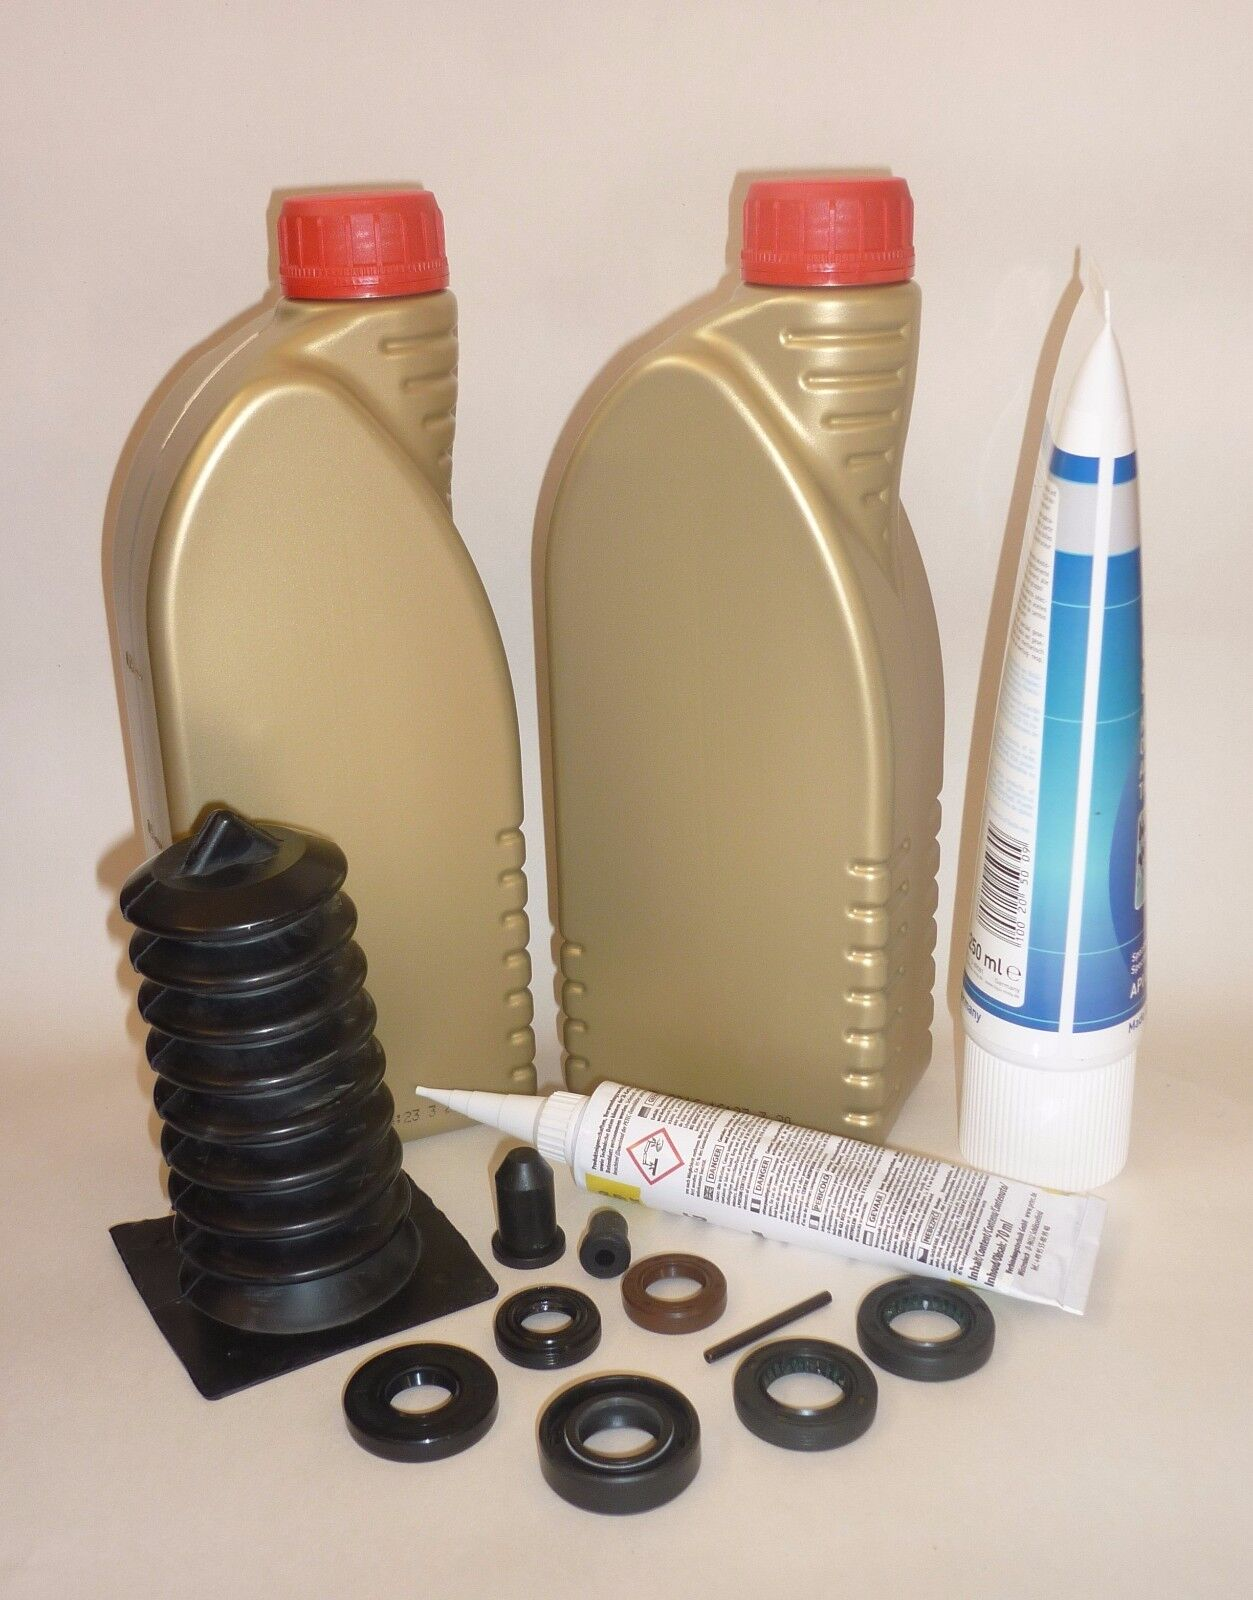 prodotti creativi Set di di di tenuta set di parti per Hydrostat ingranaggi VST 205-001 Peerless Tecumseh  economico e di alta qualità